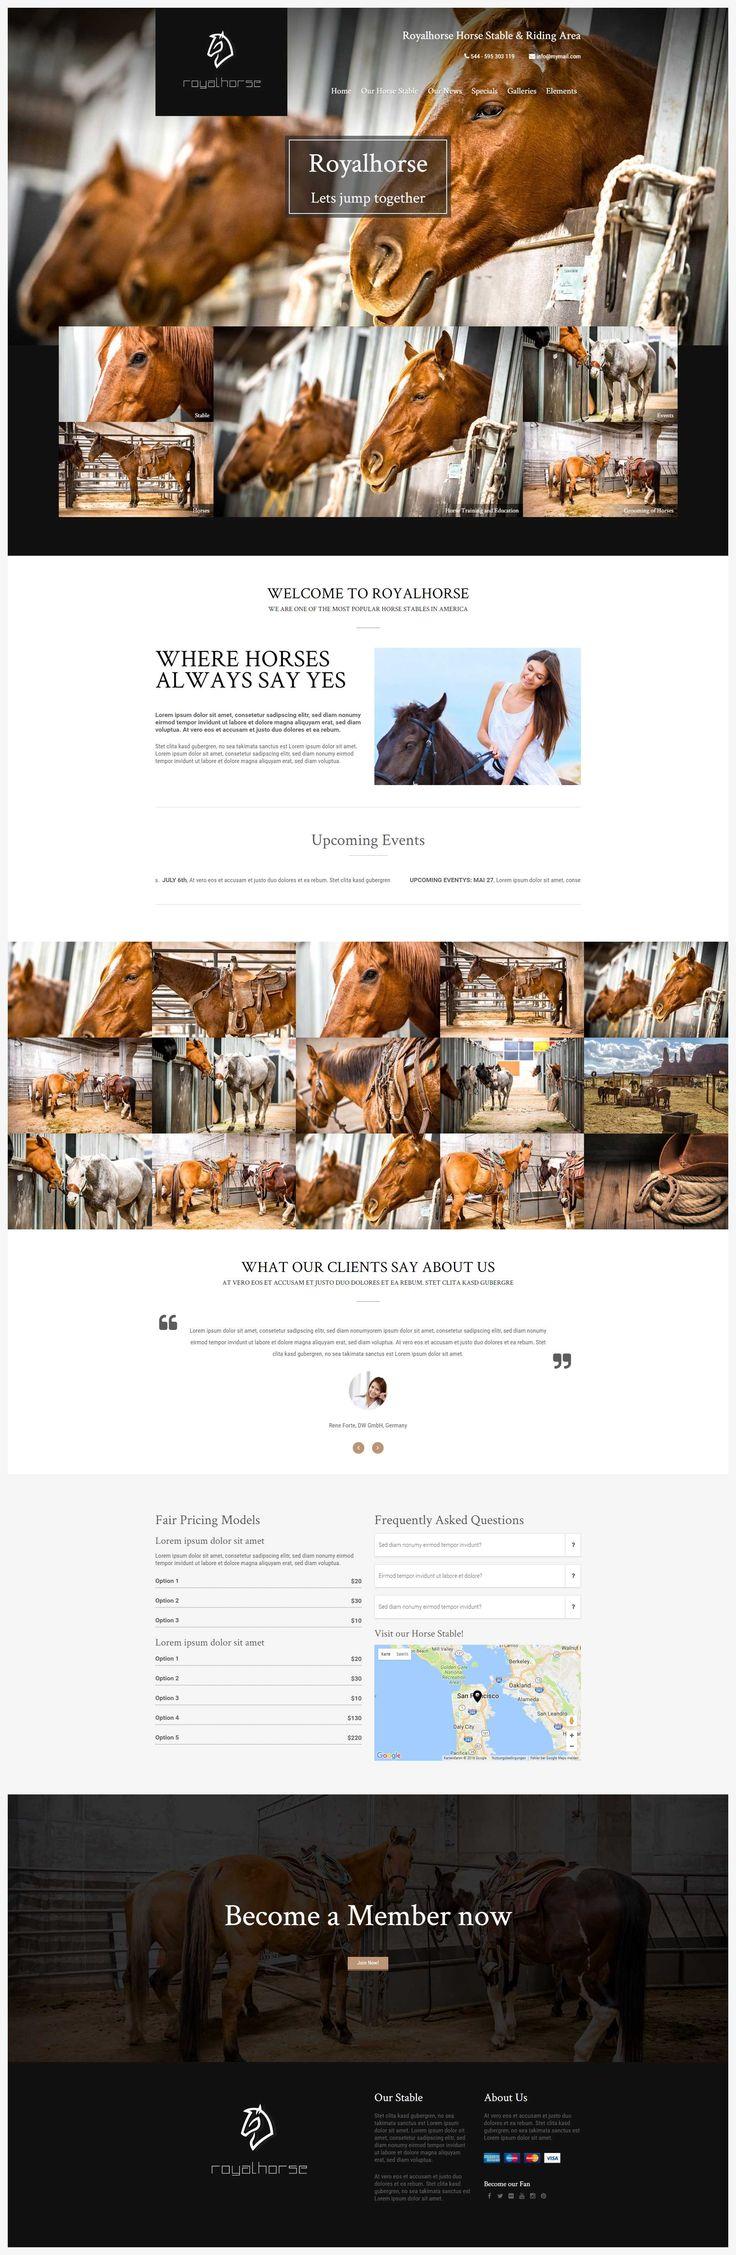 Royalhorse - Riding Stable WordPress Theme